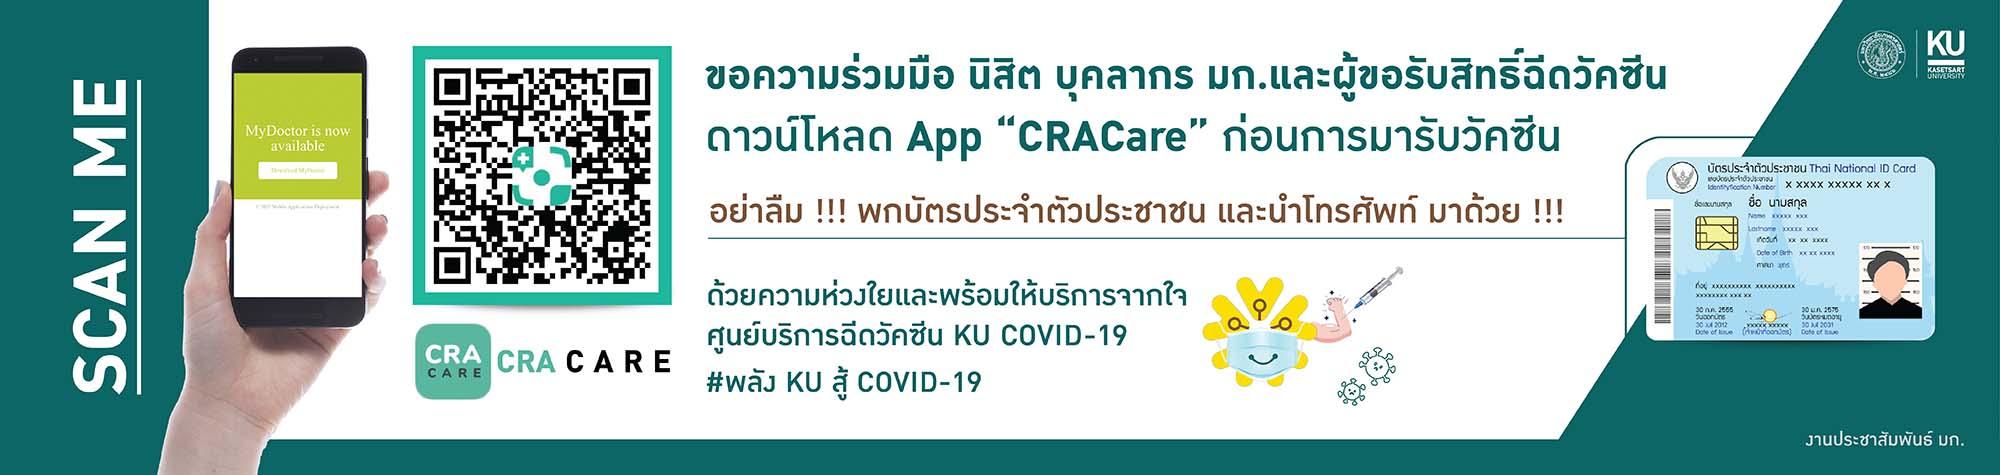 Application CRACare